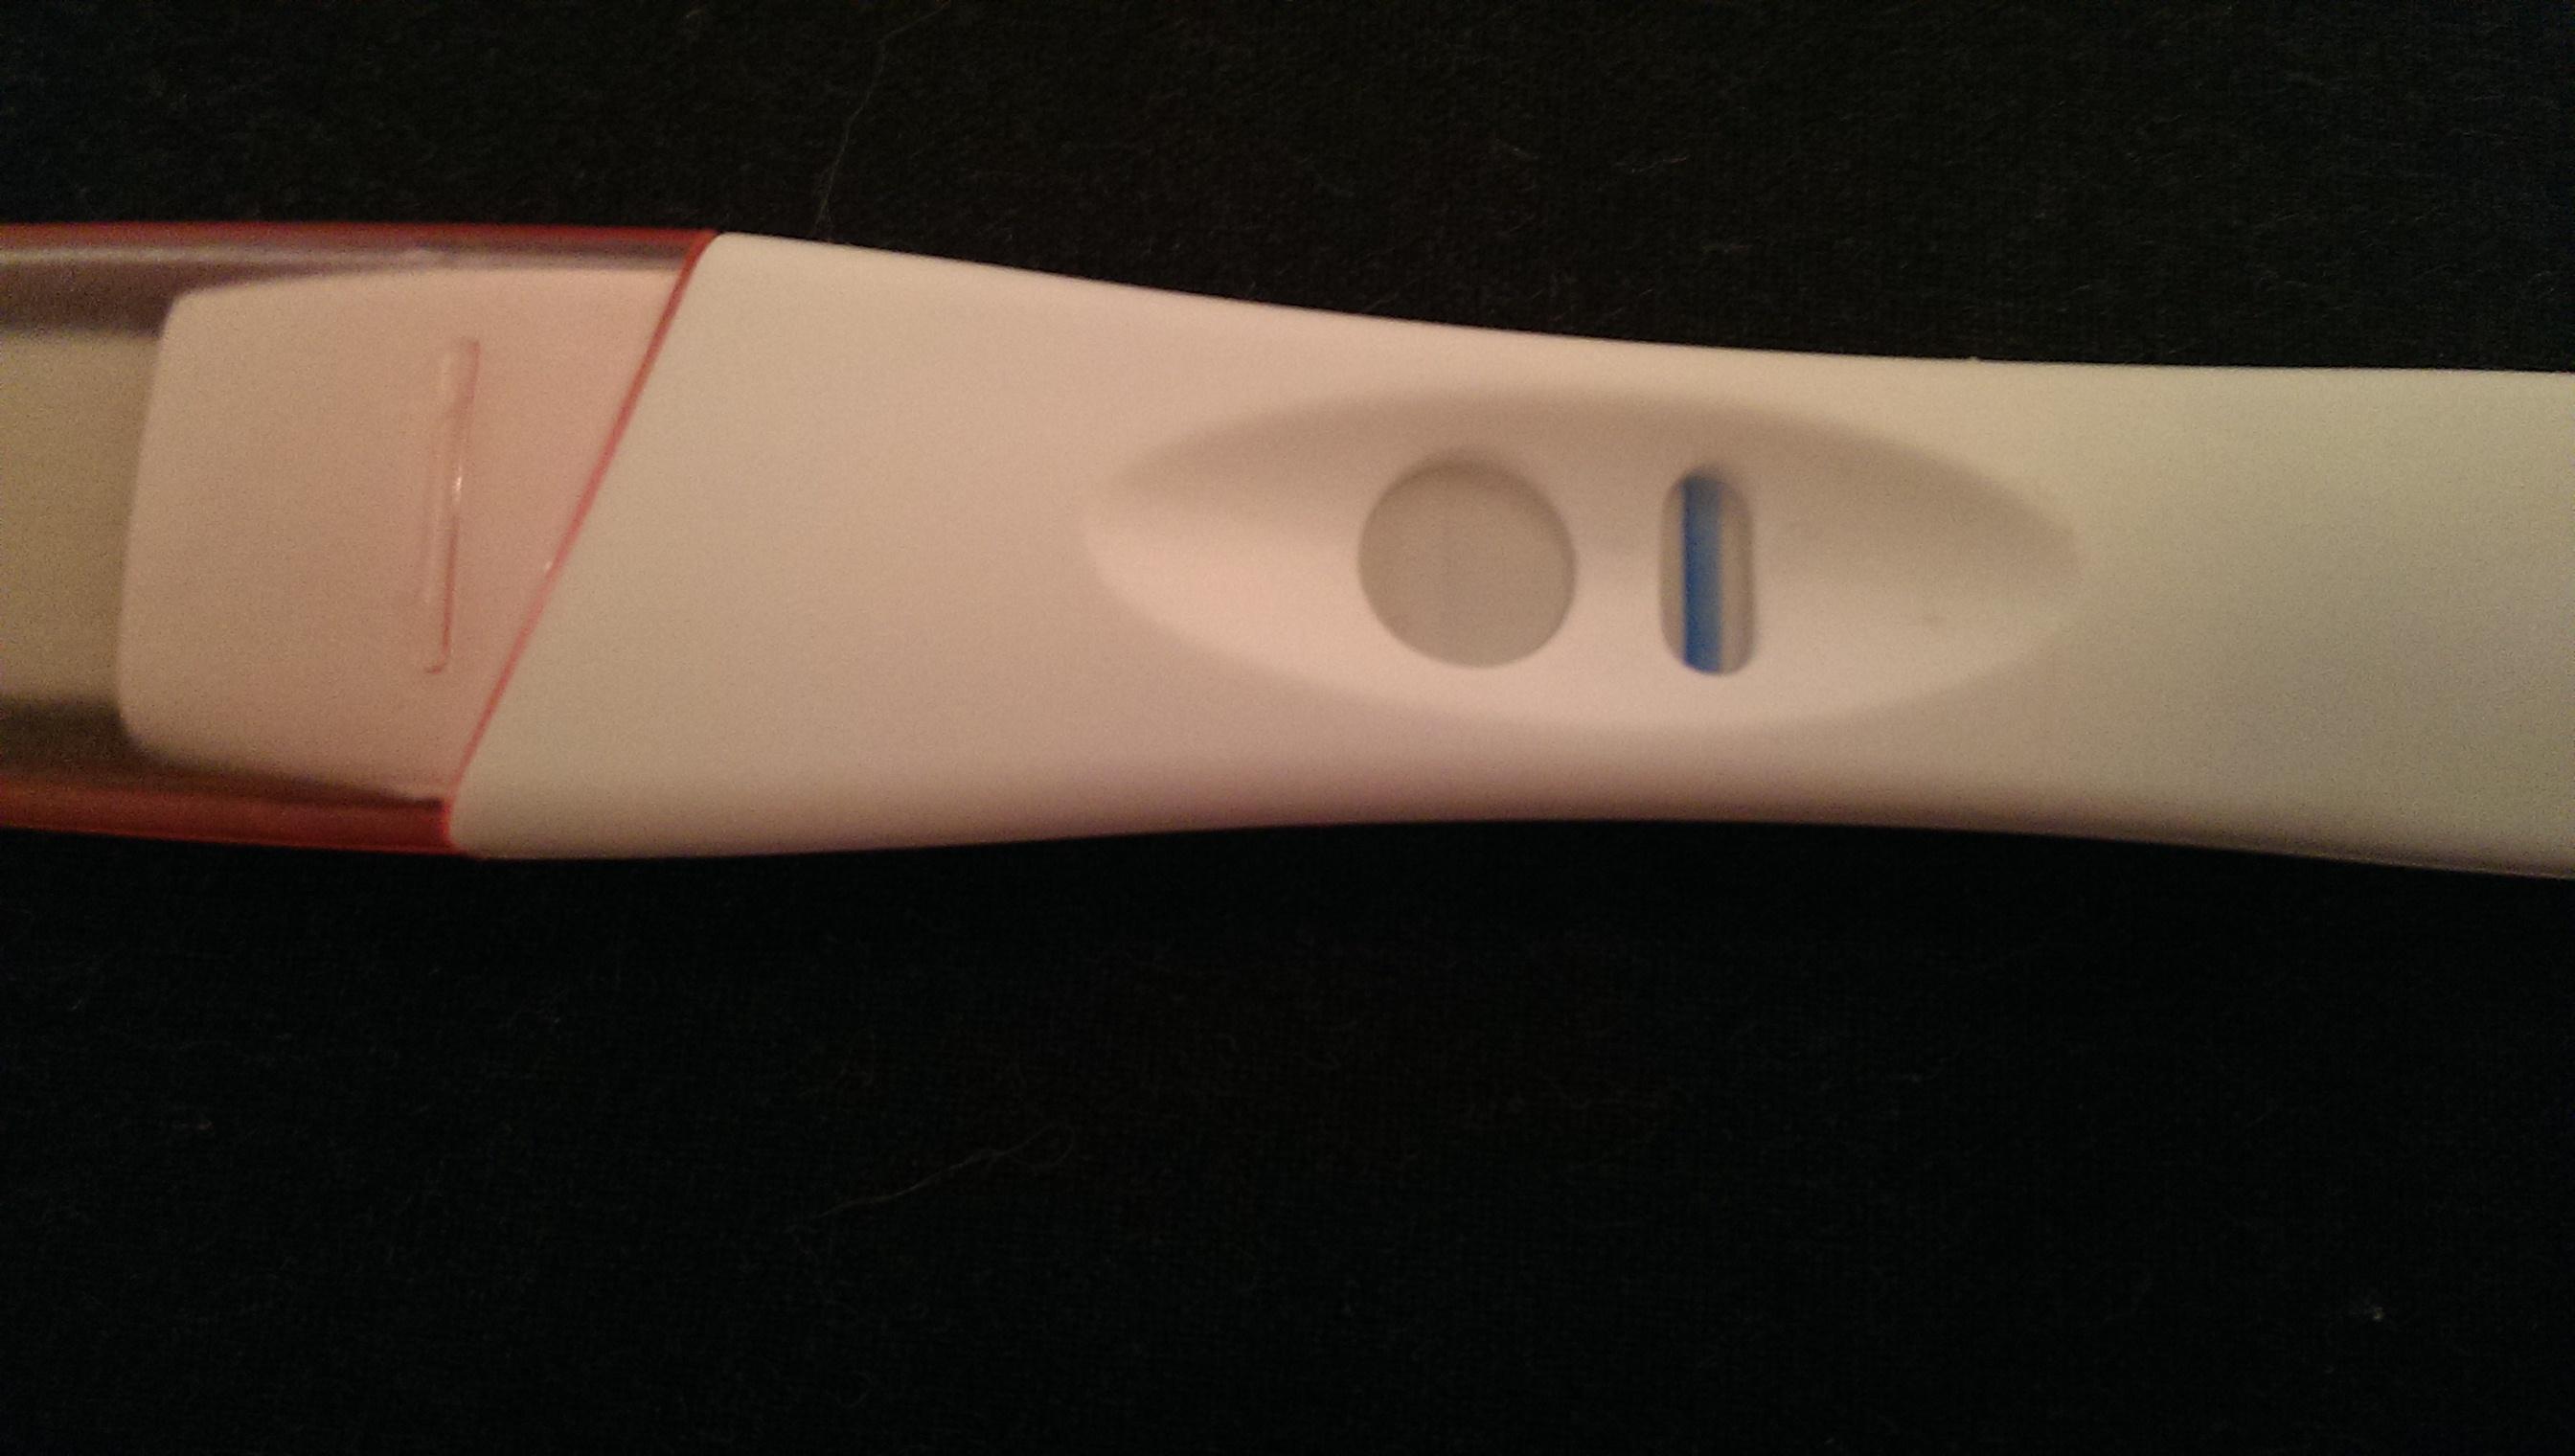 Schwangerschaftstest 2 Strich Kaum Sichtbar